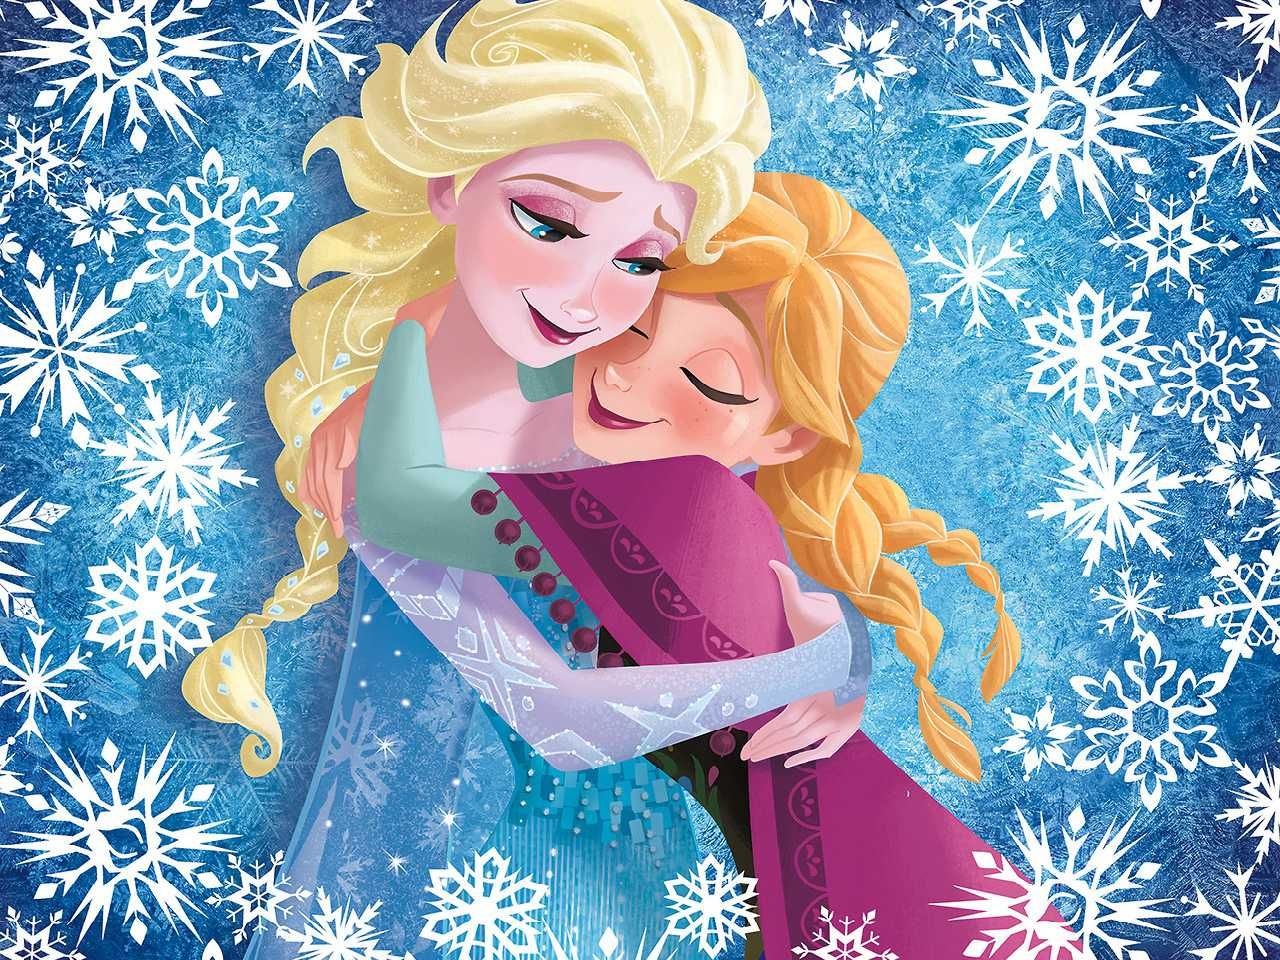 Wallpaper Of Frozen For Fans Disney Princess 2013